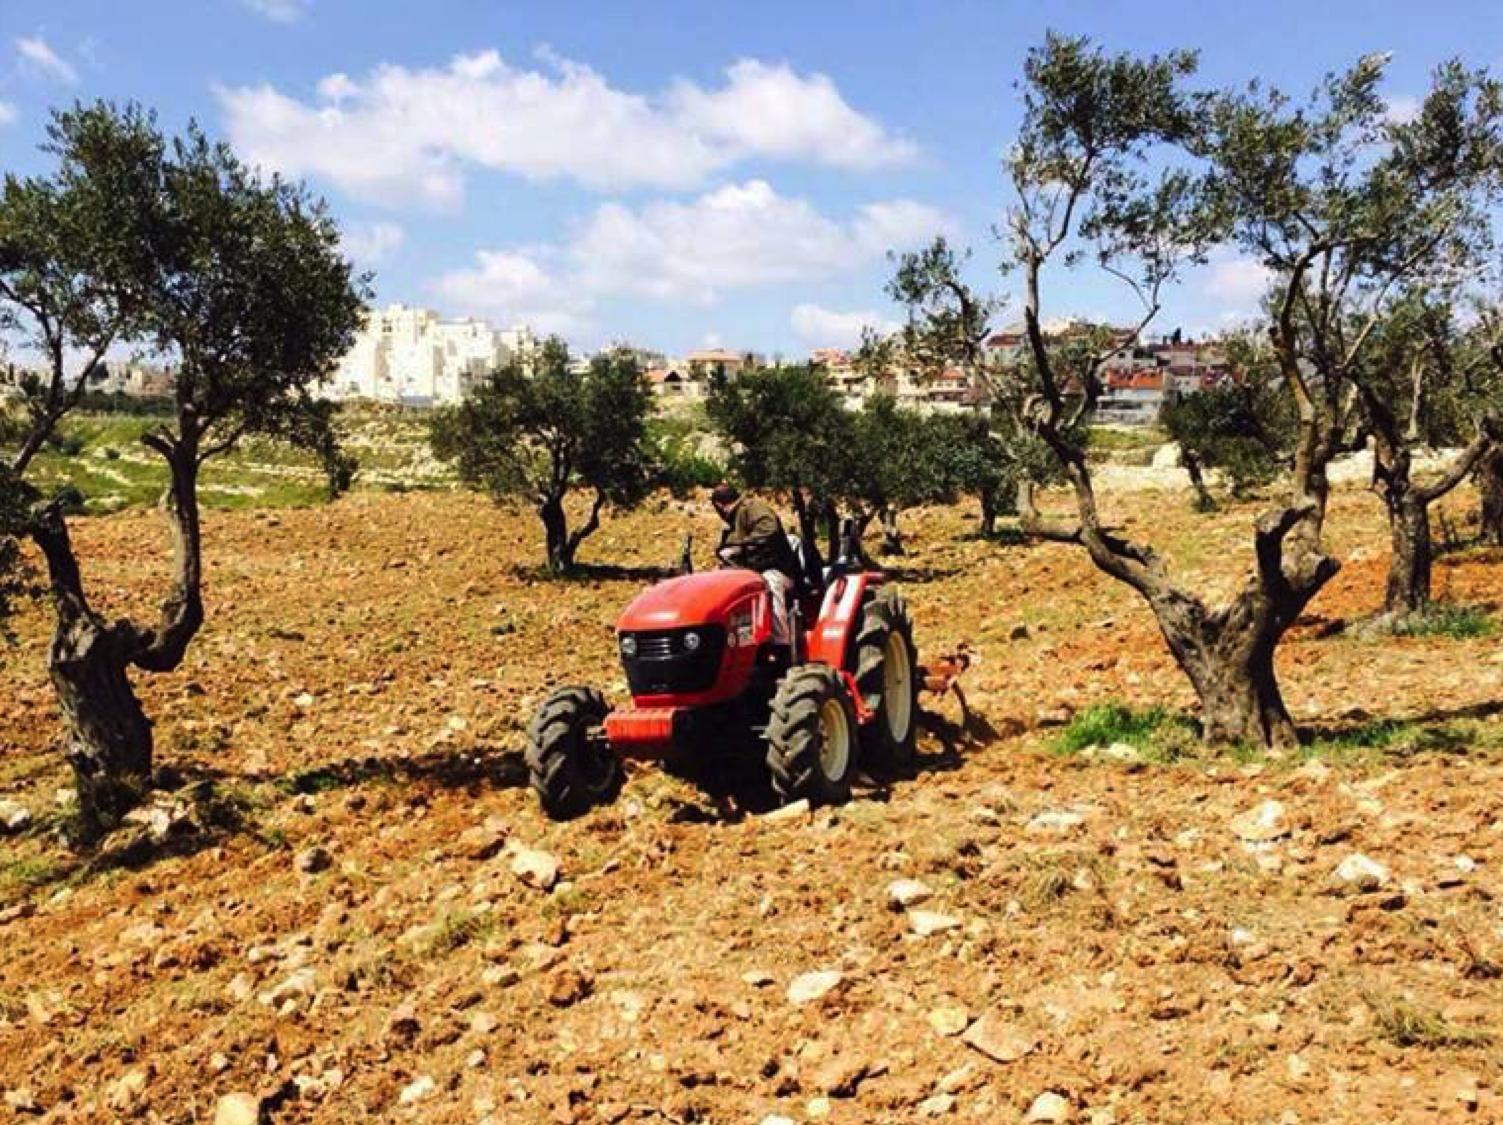 Order of Malta Olive Oil from Tantur